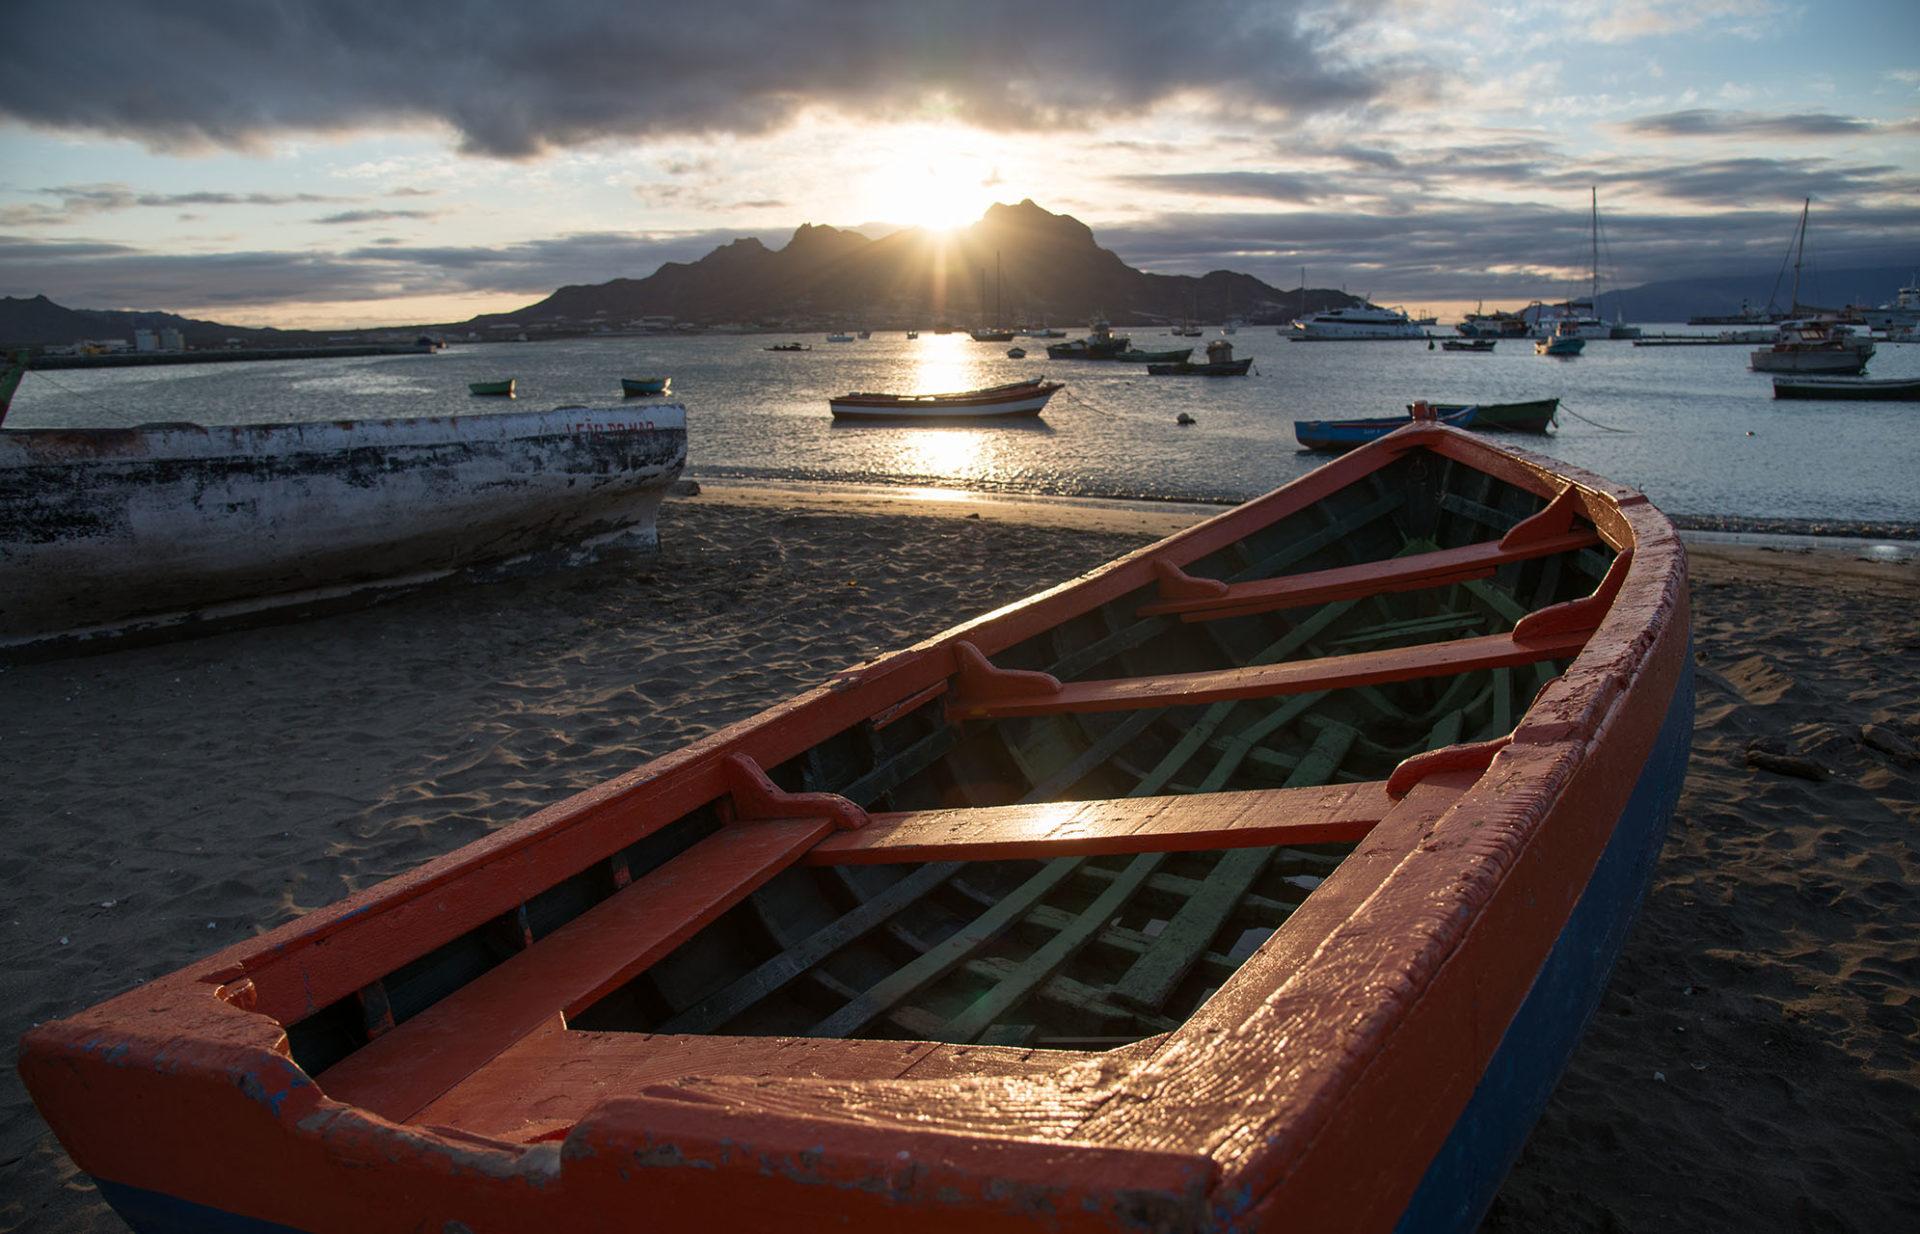 cap-vert-photographe-ile-de-france-maya-angelsen-evenementiel-mindelo-2015